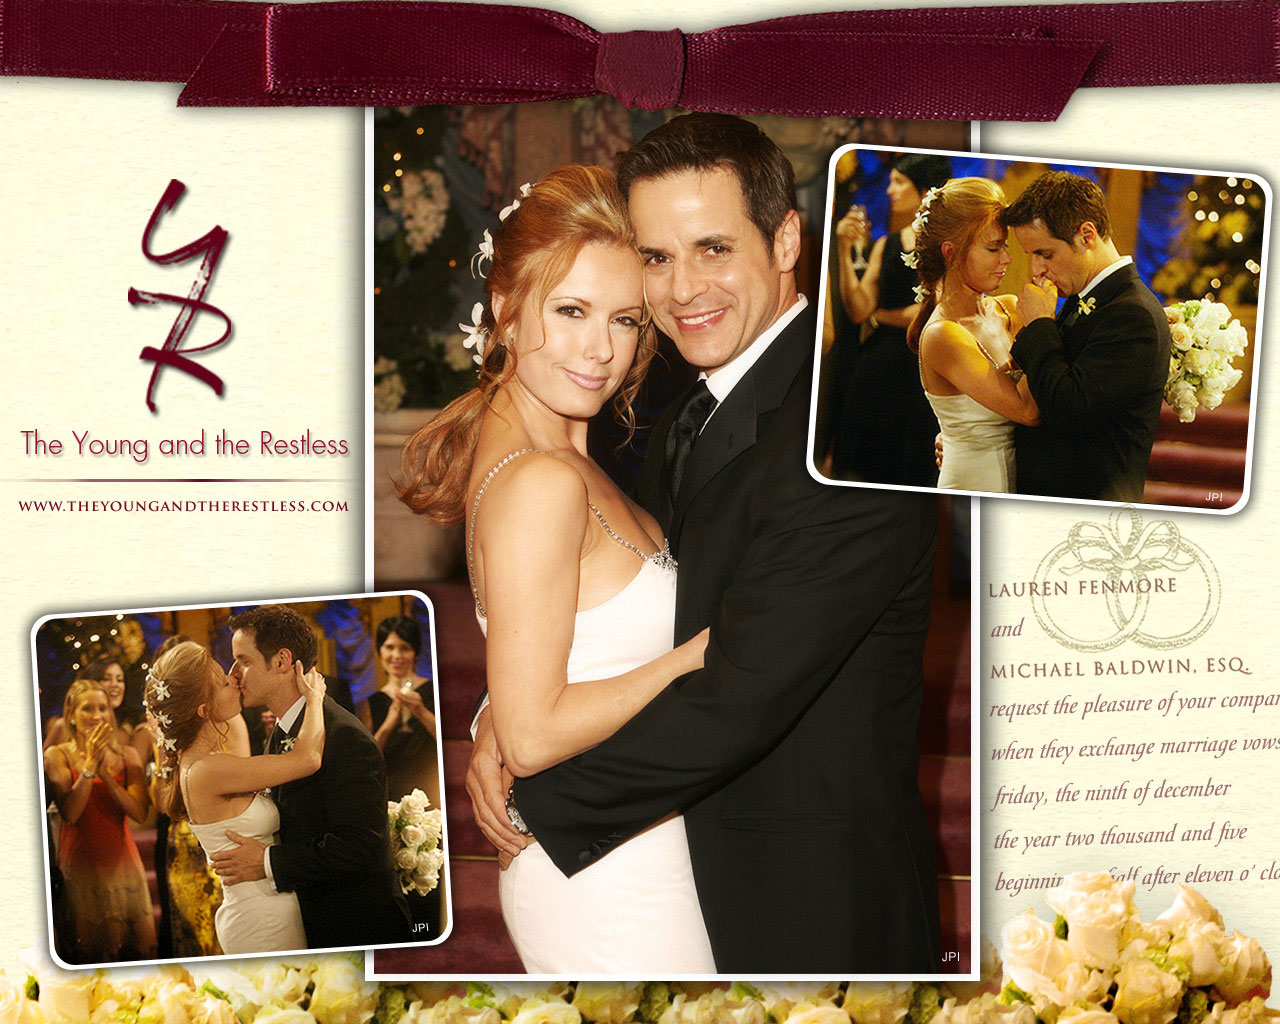 yr lauren and michael wedding wallpaper wedding wallpaper 1280x1024